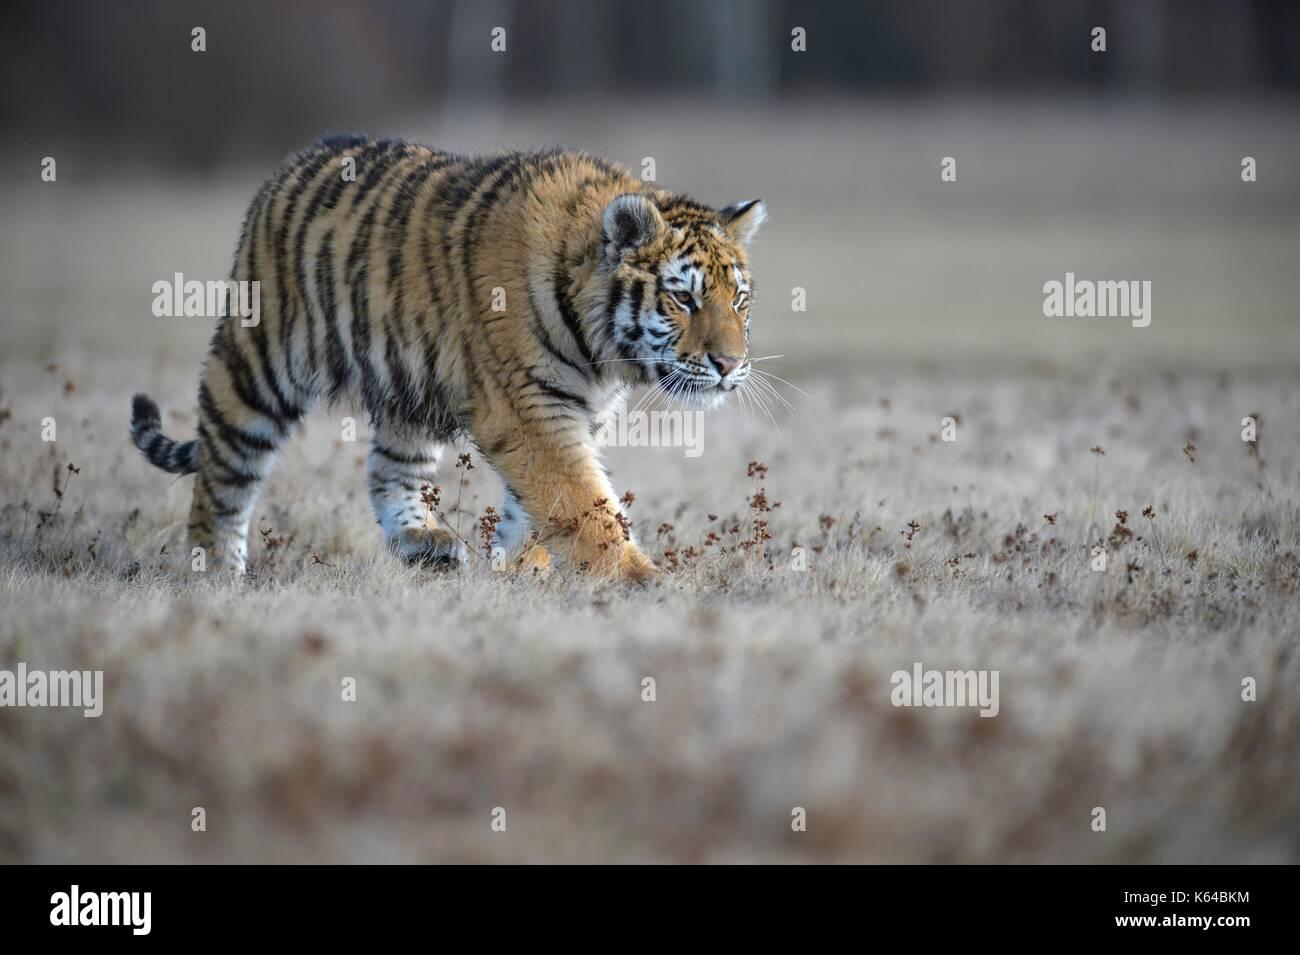 Tigre siberiano (Panthera tigris altaica), se ejecuta en una pradera cercana, cautiva, Moravia, República Checa Foto de stock